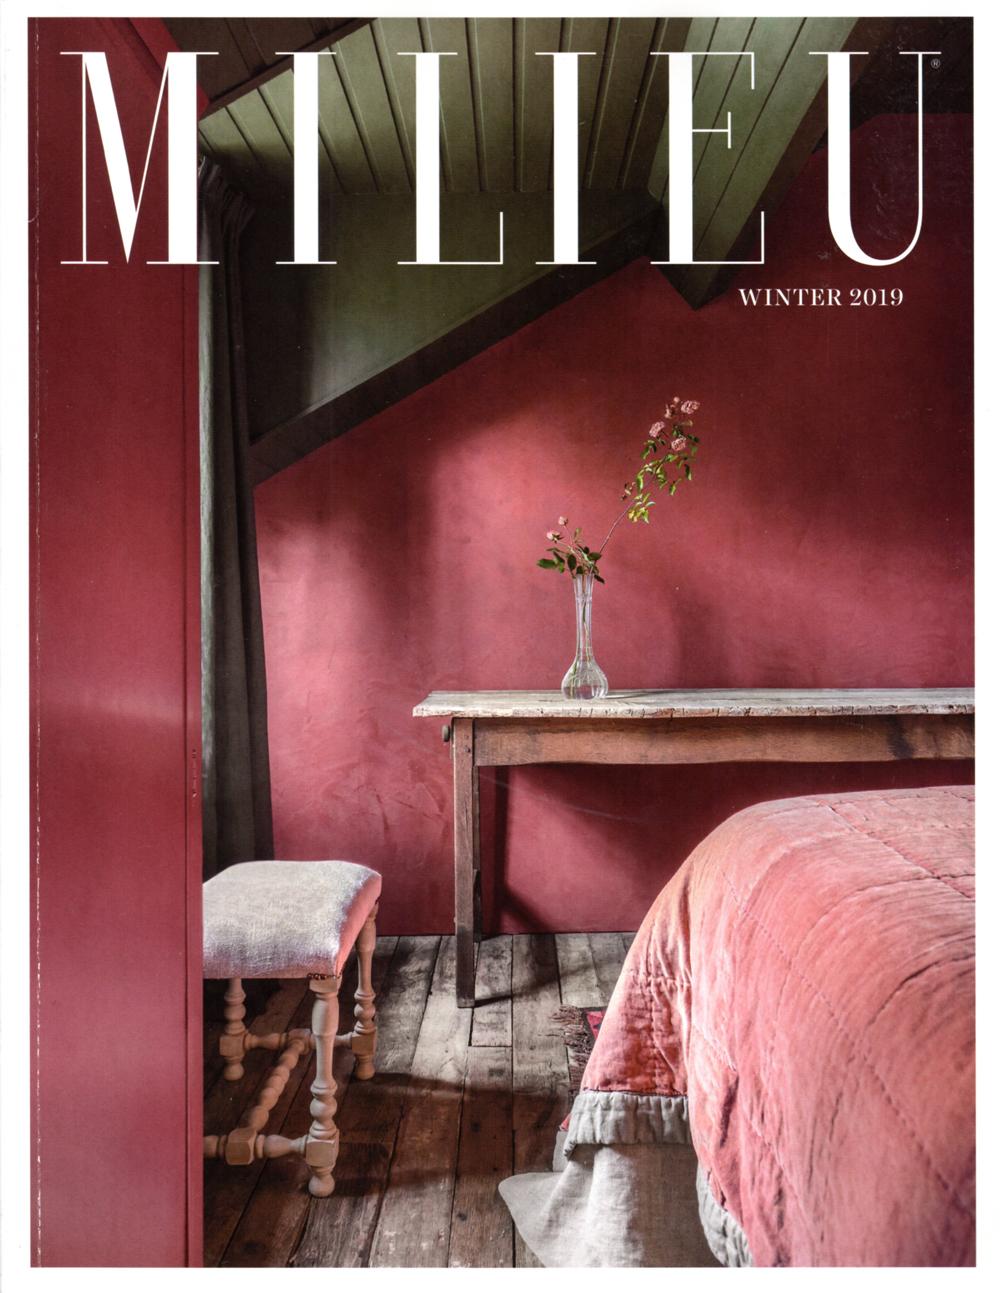 Pennoyer Newman in Milieu Magazine Winter 2019